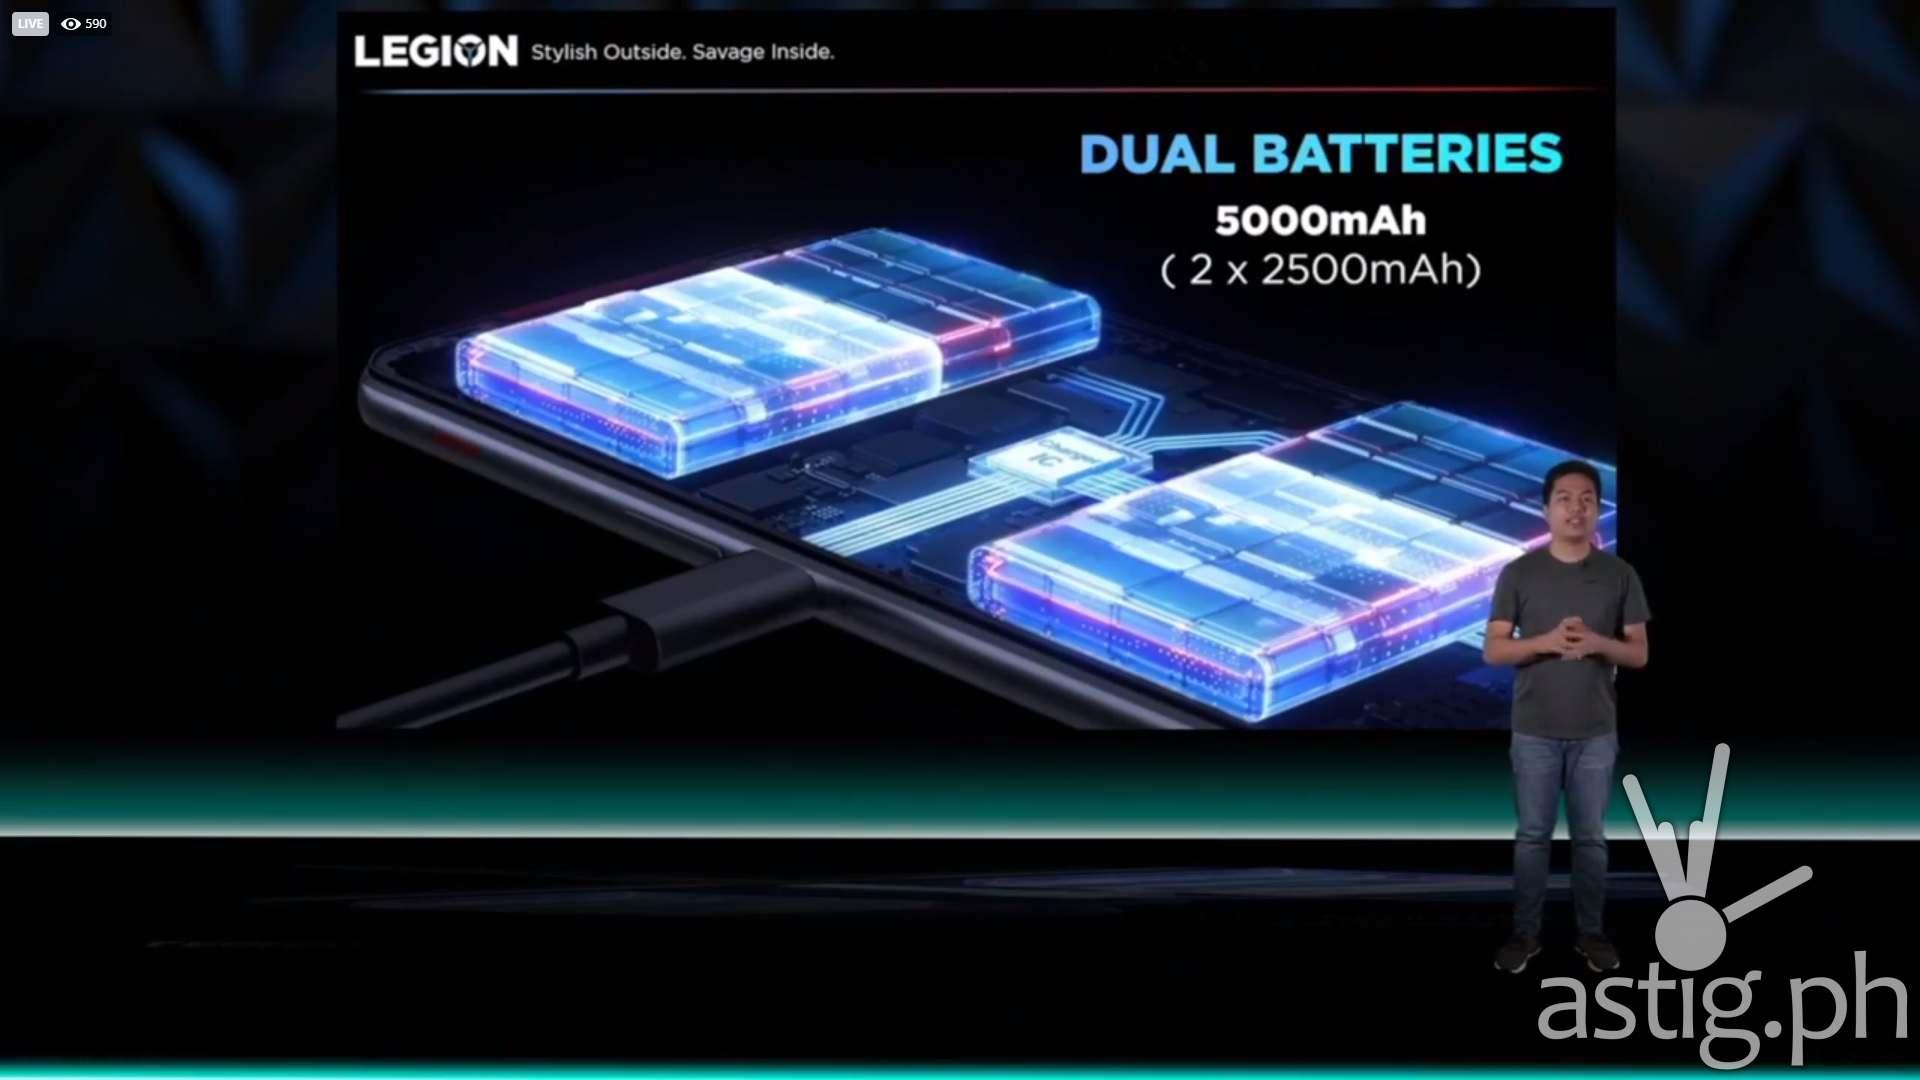 Dual battery - Legion Phone Dual